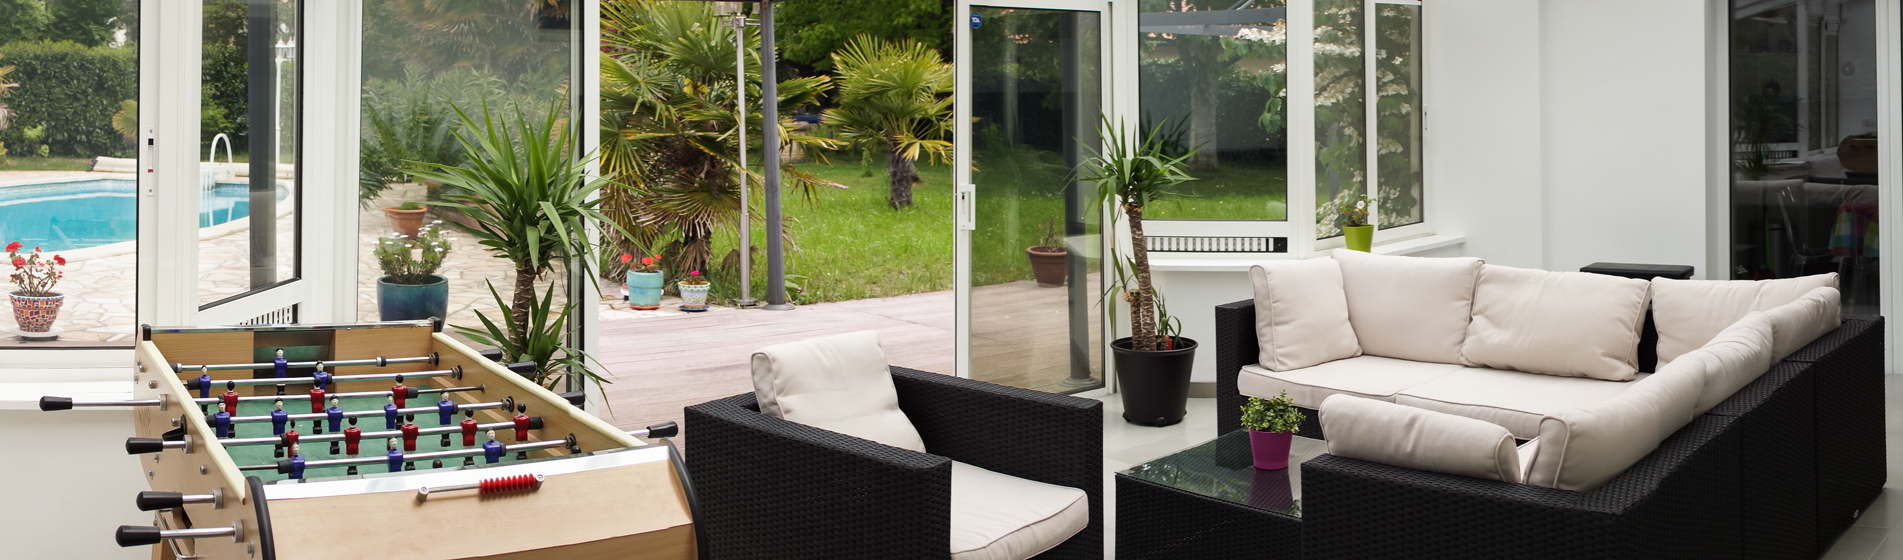 achat véranda toiture plate 30 Gard